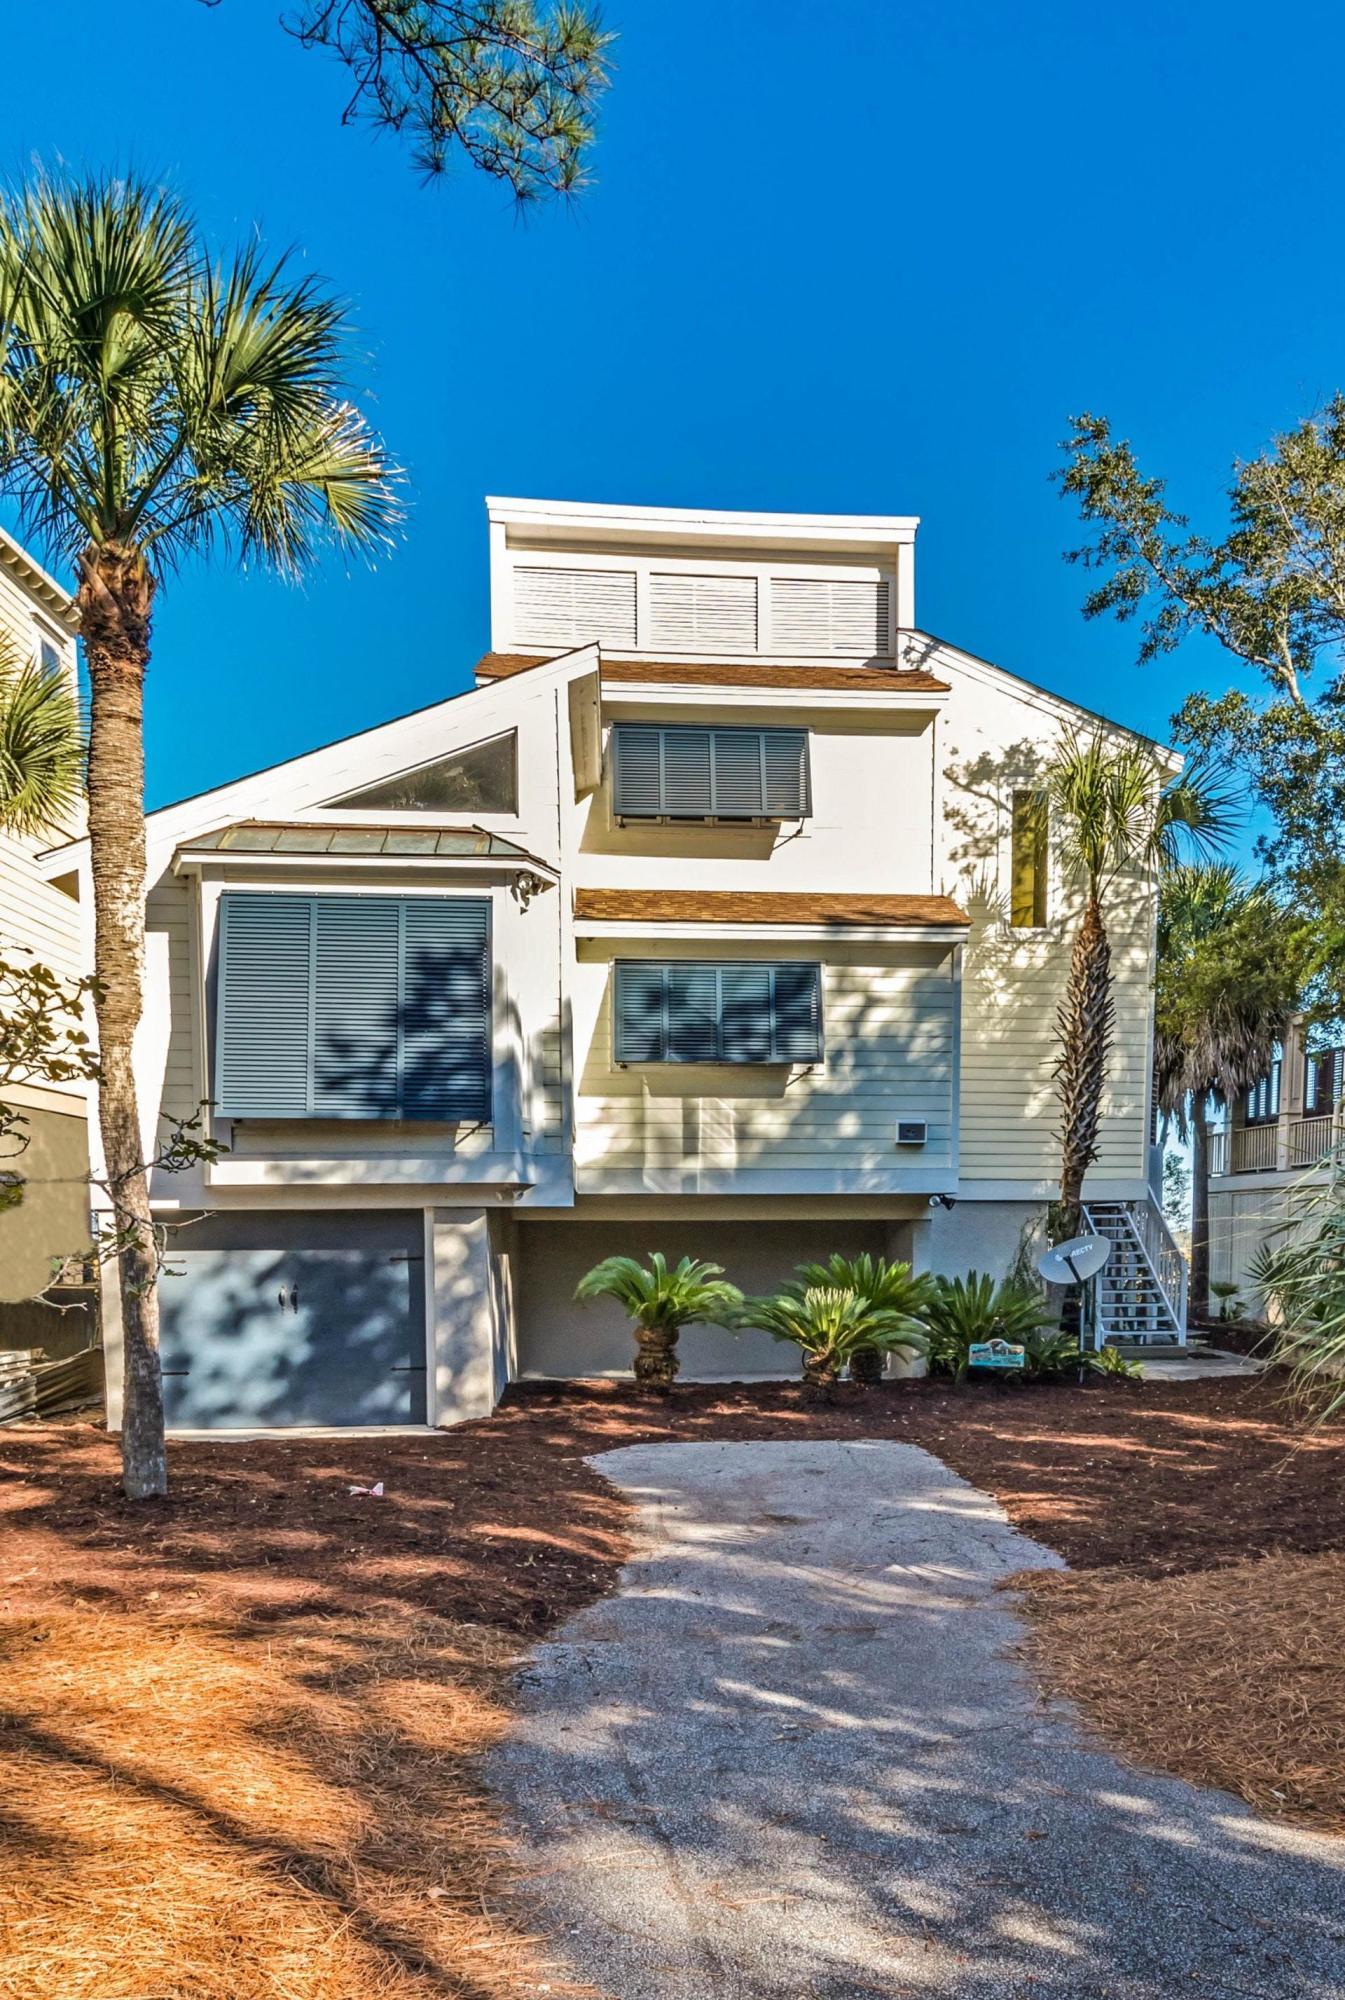 Wild Dunes Homes For Sale - 25 Marsh Island, Isle of Palms, SC - 16